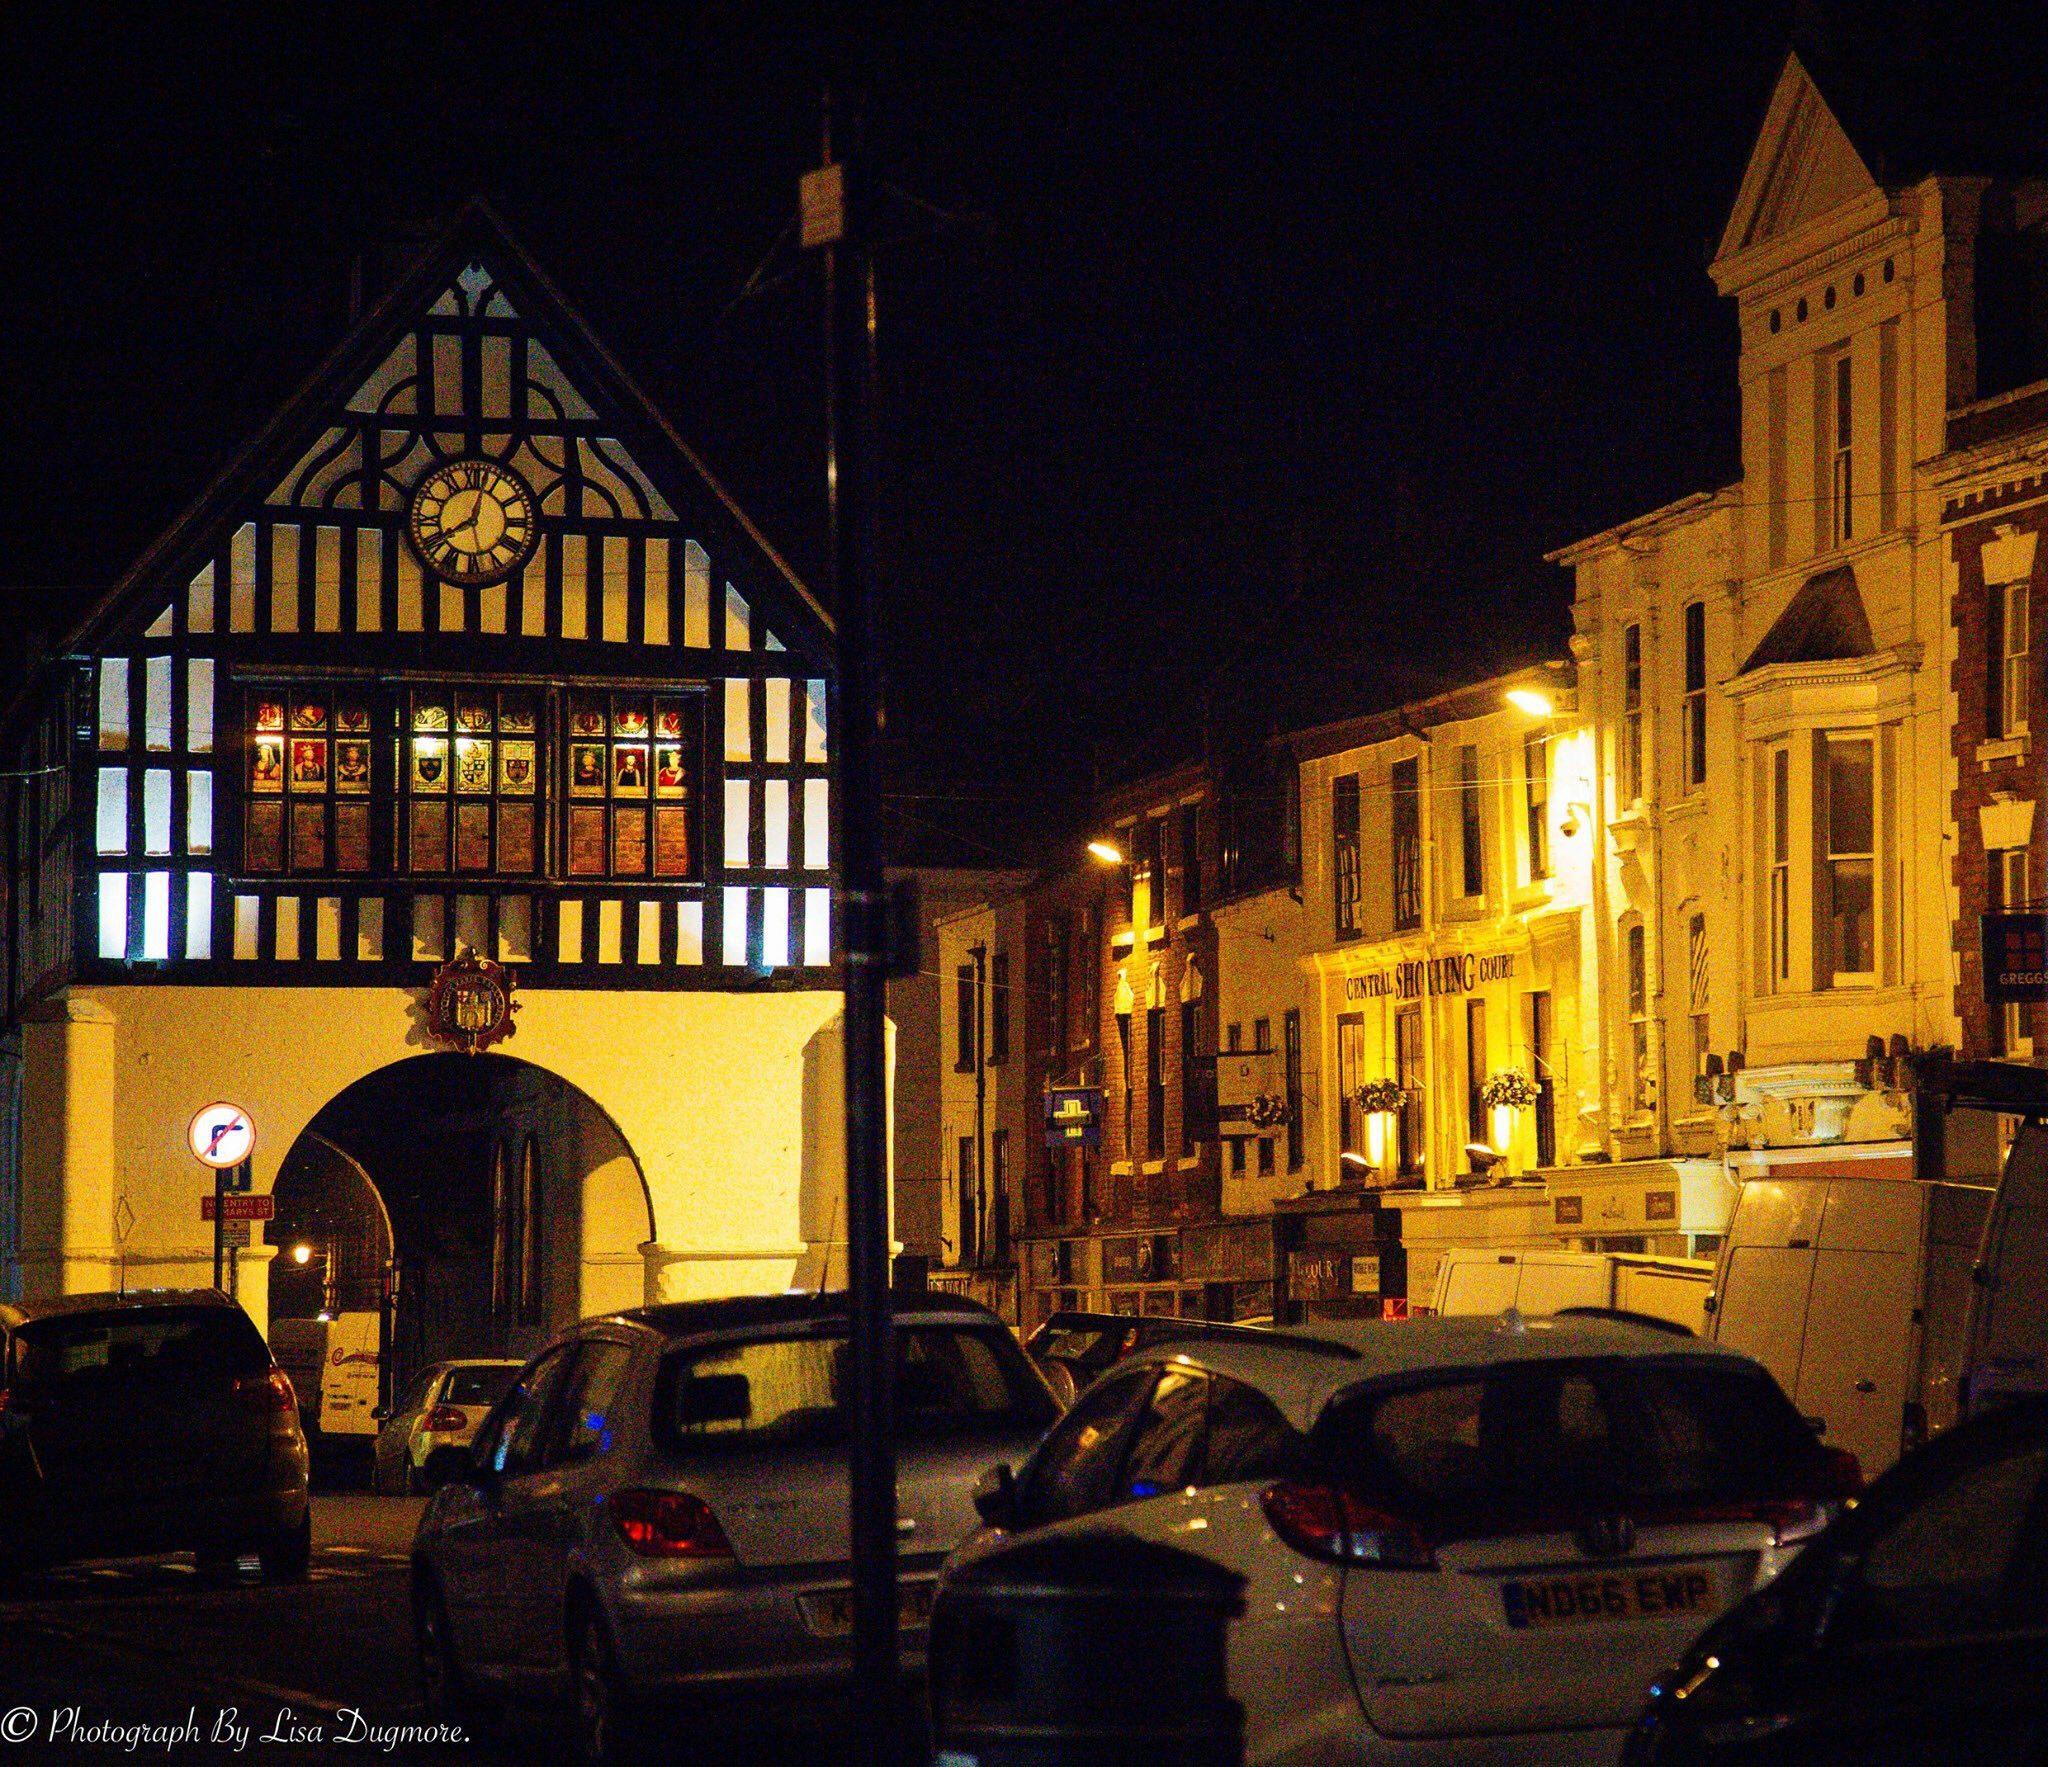 Town Hall at Night